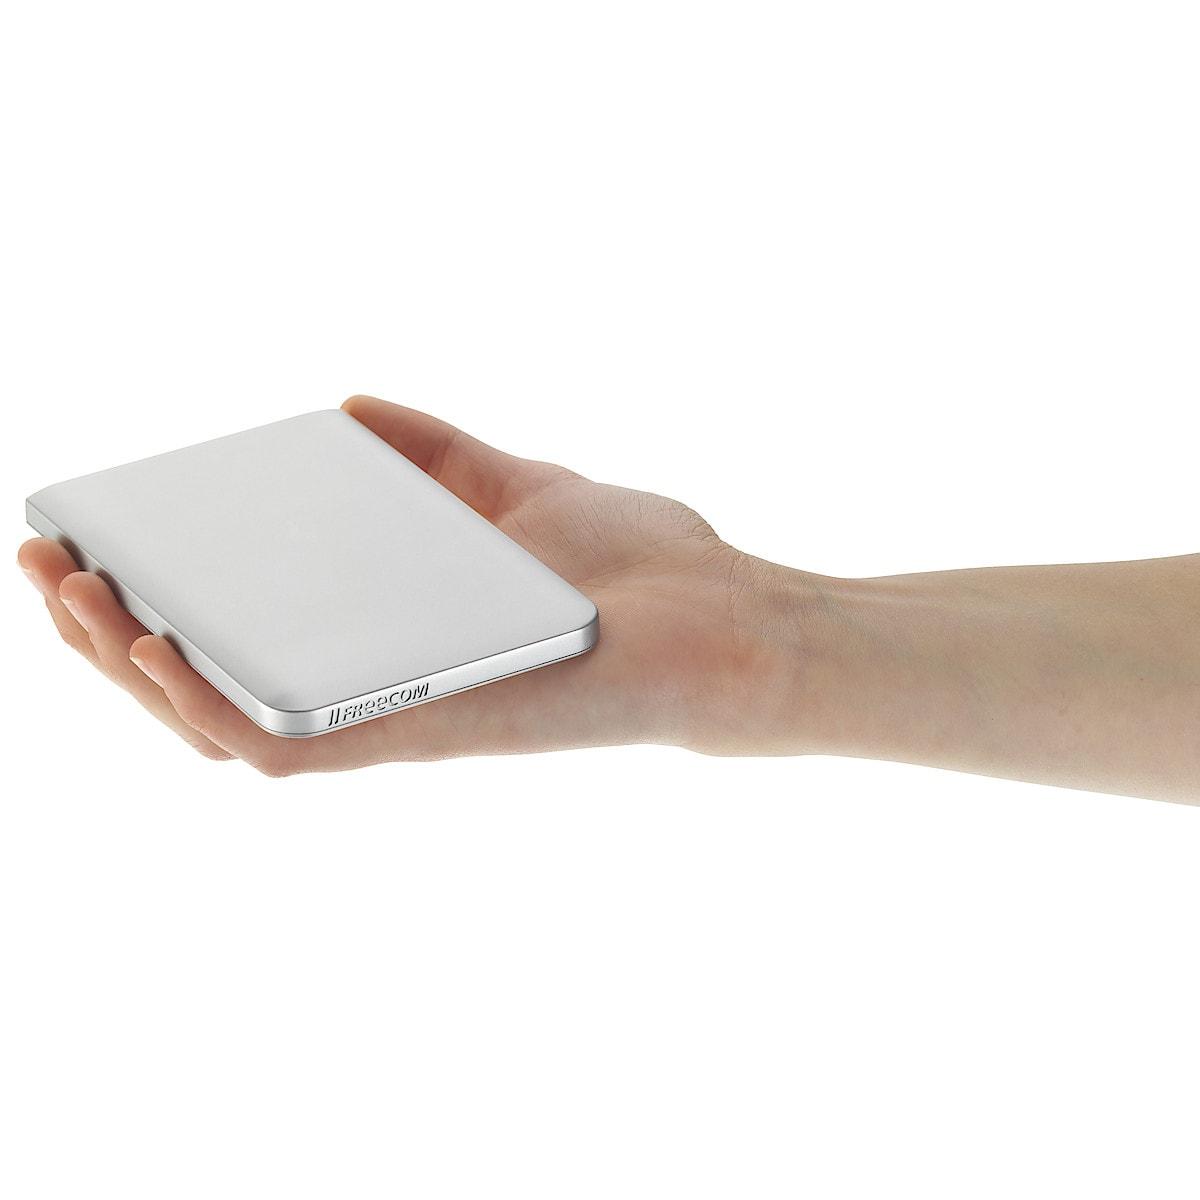 Freecom MG MAC USB 3.0, 1TB ekstern harddisk